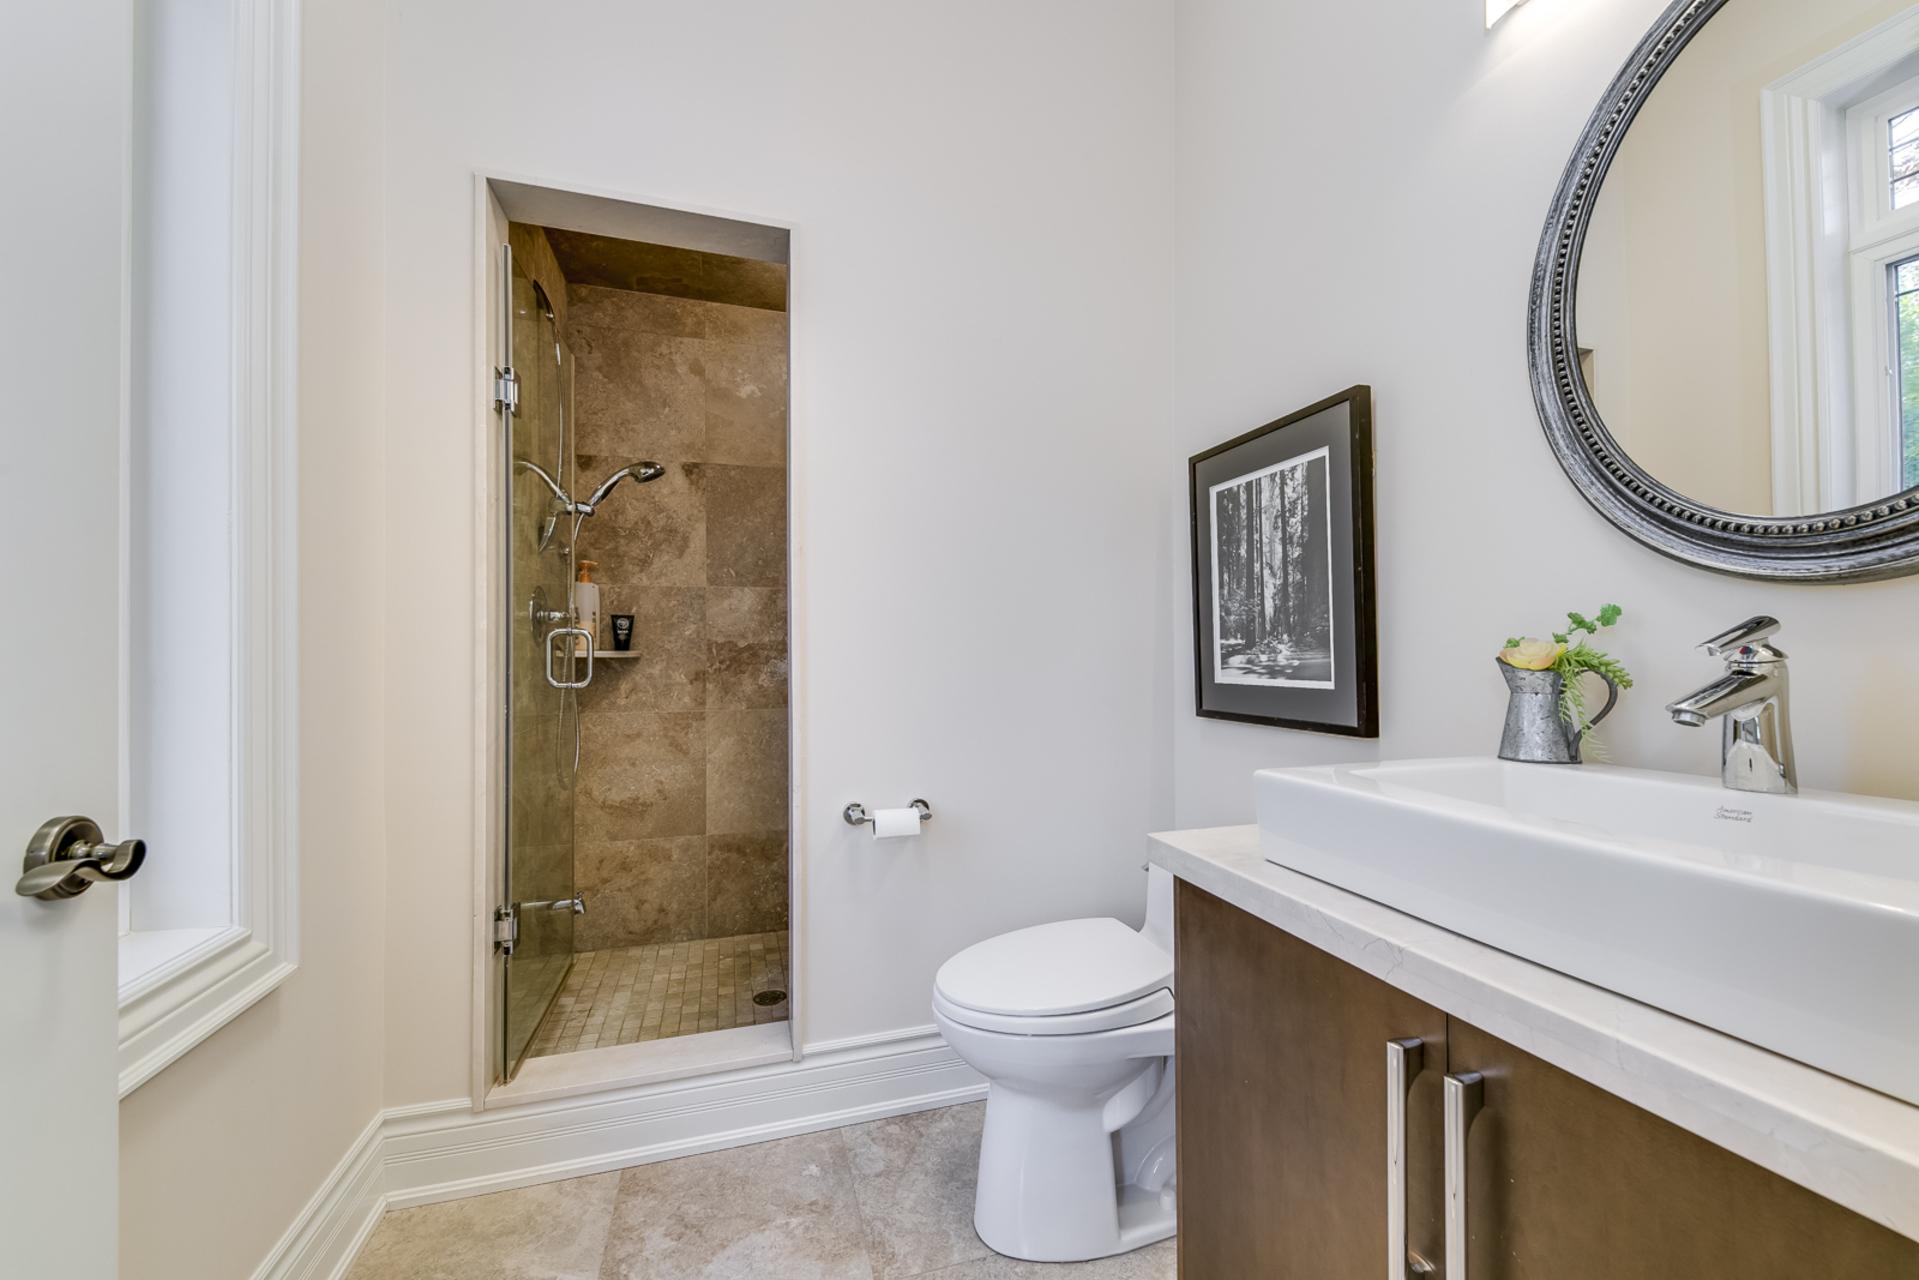 4th Bedroom Ensuite - 5041 Lakeshore Rd, Burlington - Elite3 & Team at 5041 Lakeshore Road, Appleby, Burlington